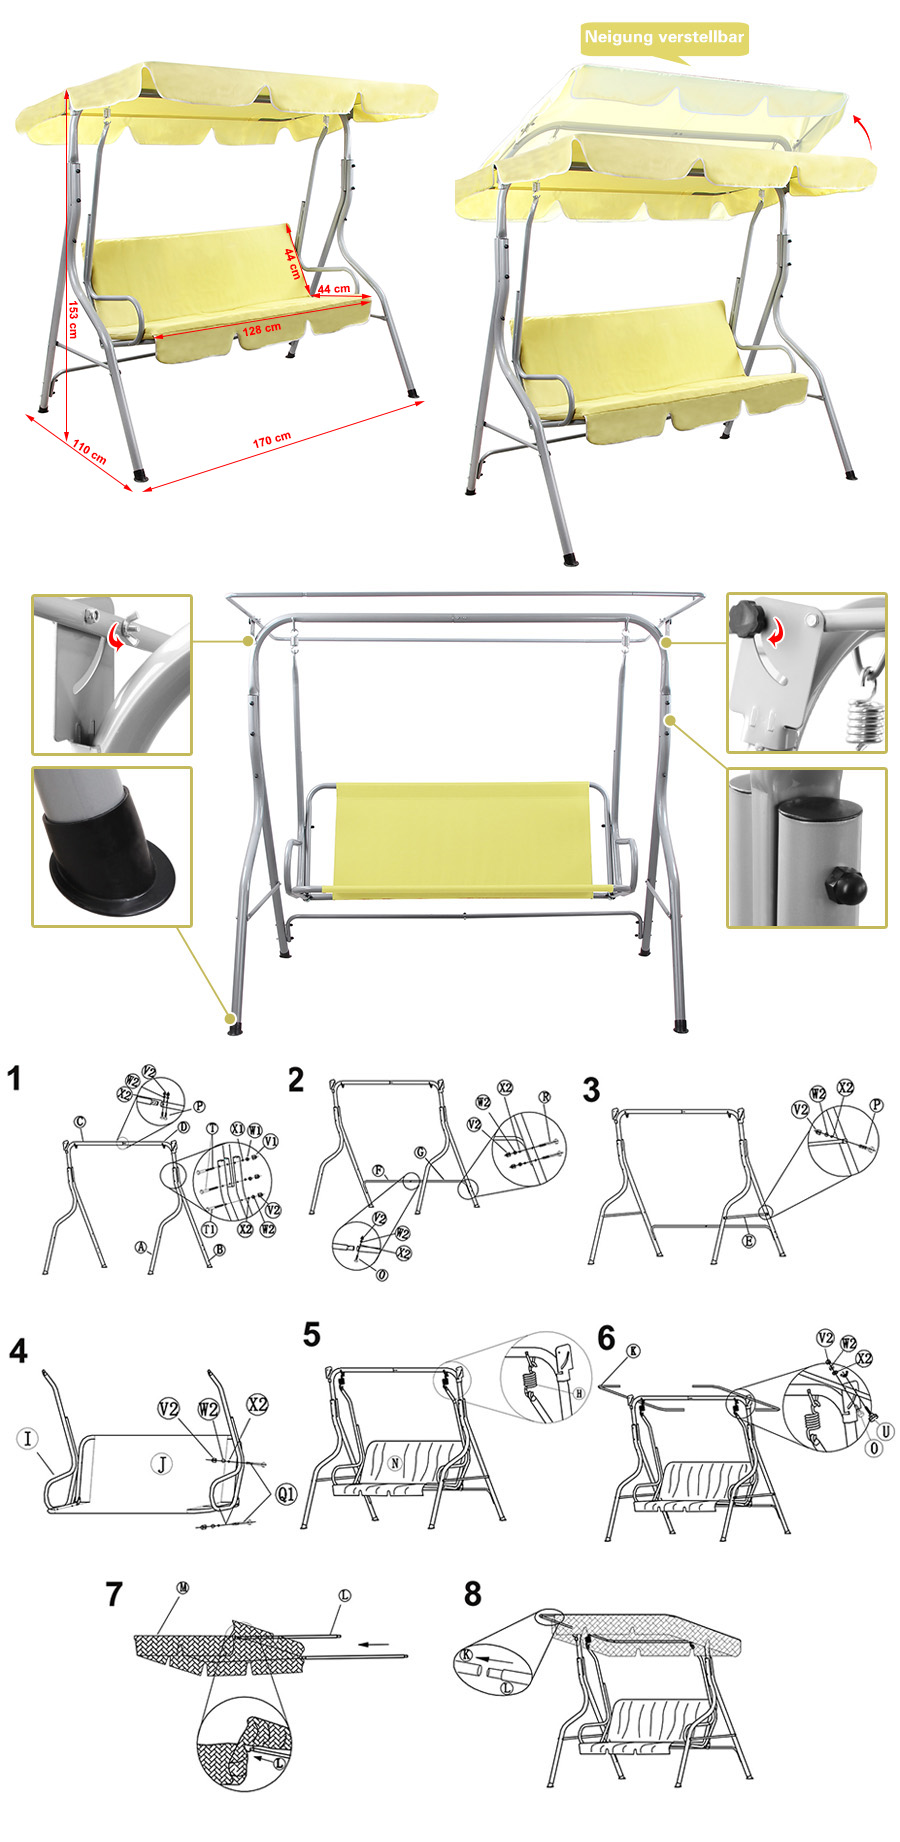 songmics hollywoodschaukel gartenschaukel gartenbank gartenm bel 3 sitzer ghs17m ebay. Black Bedroom Furniture Sets. Home Design Ideas